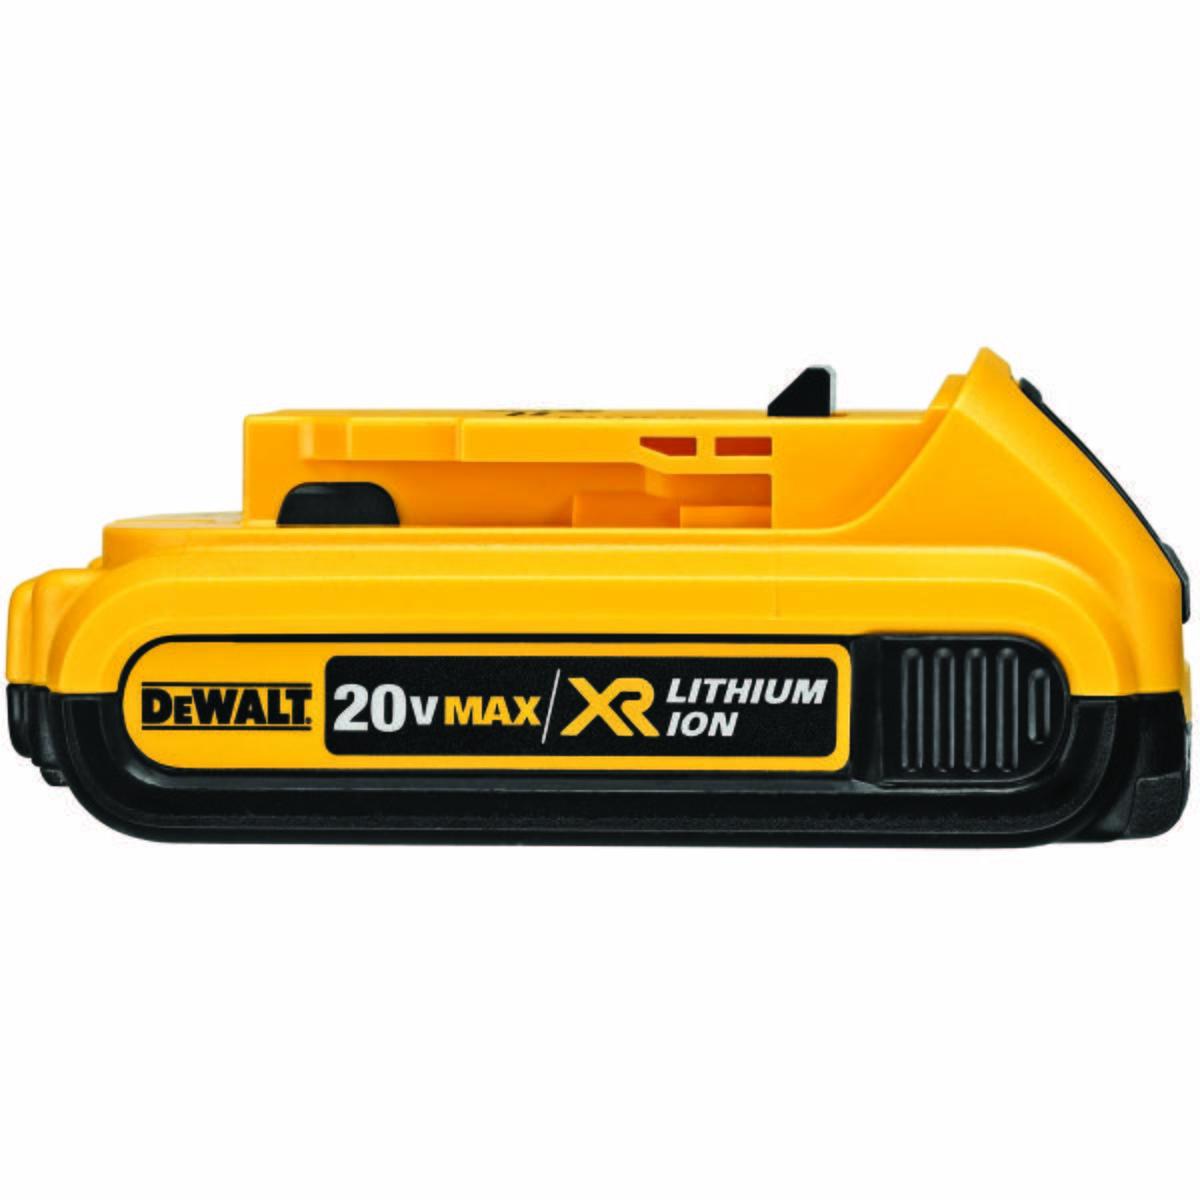 20V MAX 2.0AH LI-ION BATTERY